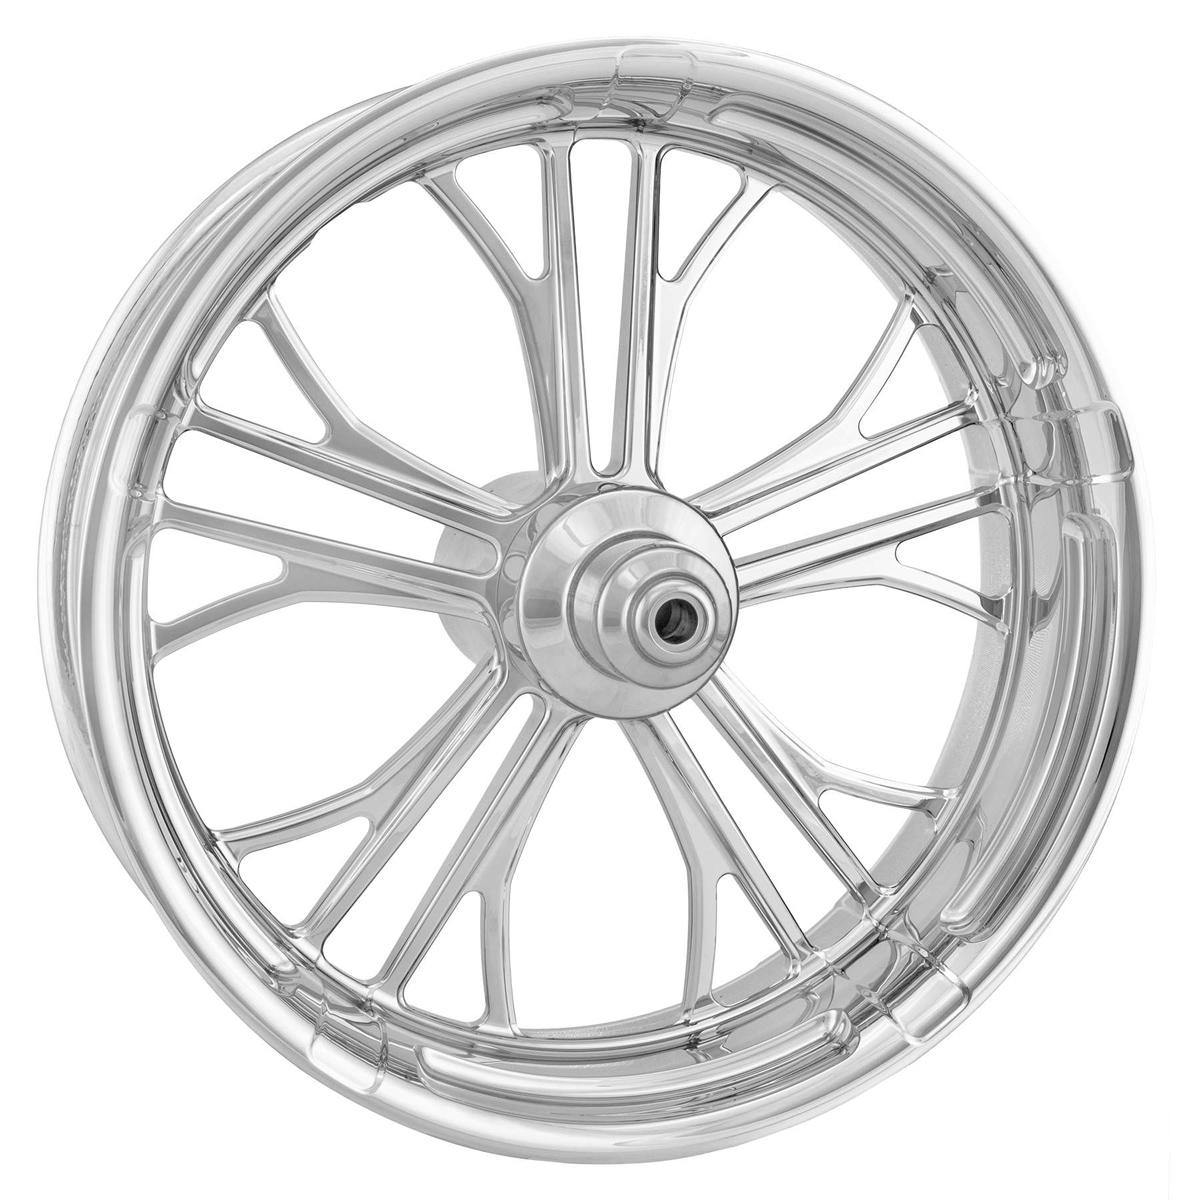 Performance Machine Dixon Chrome Rear Wheel 18x3.5 Non-ABS